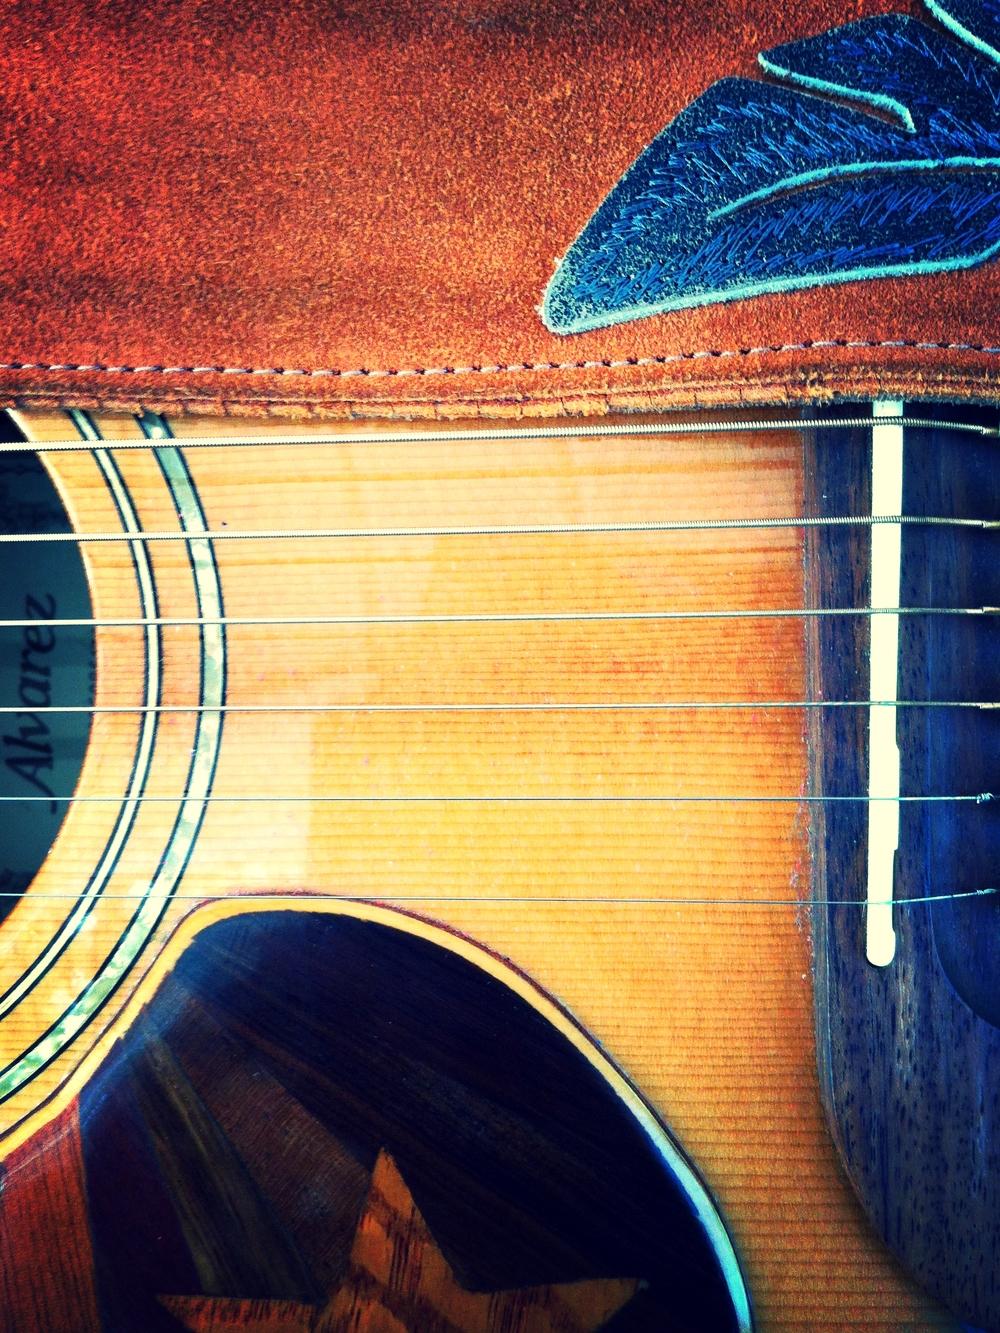 A_snapshot_of_Lindsay's_guitar